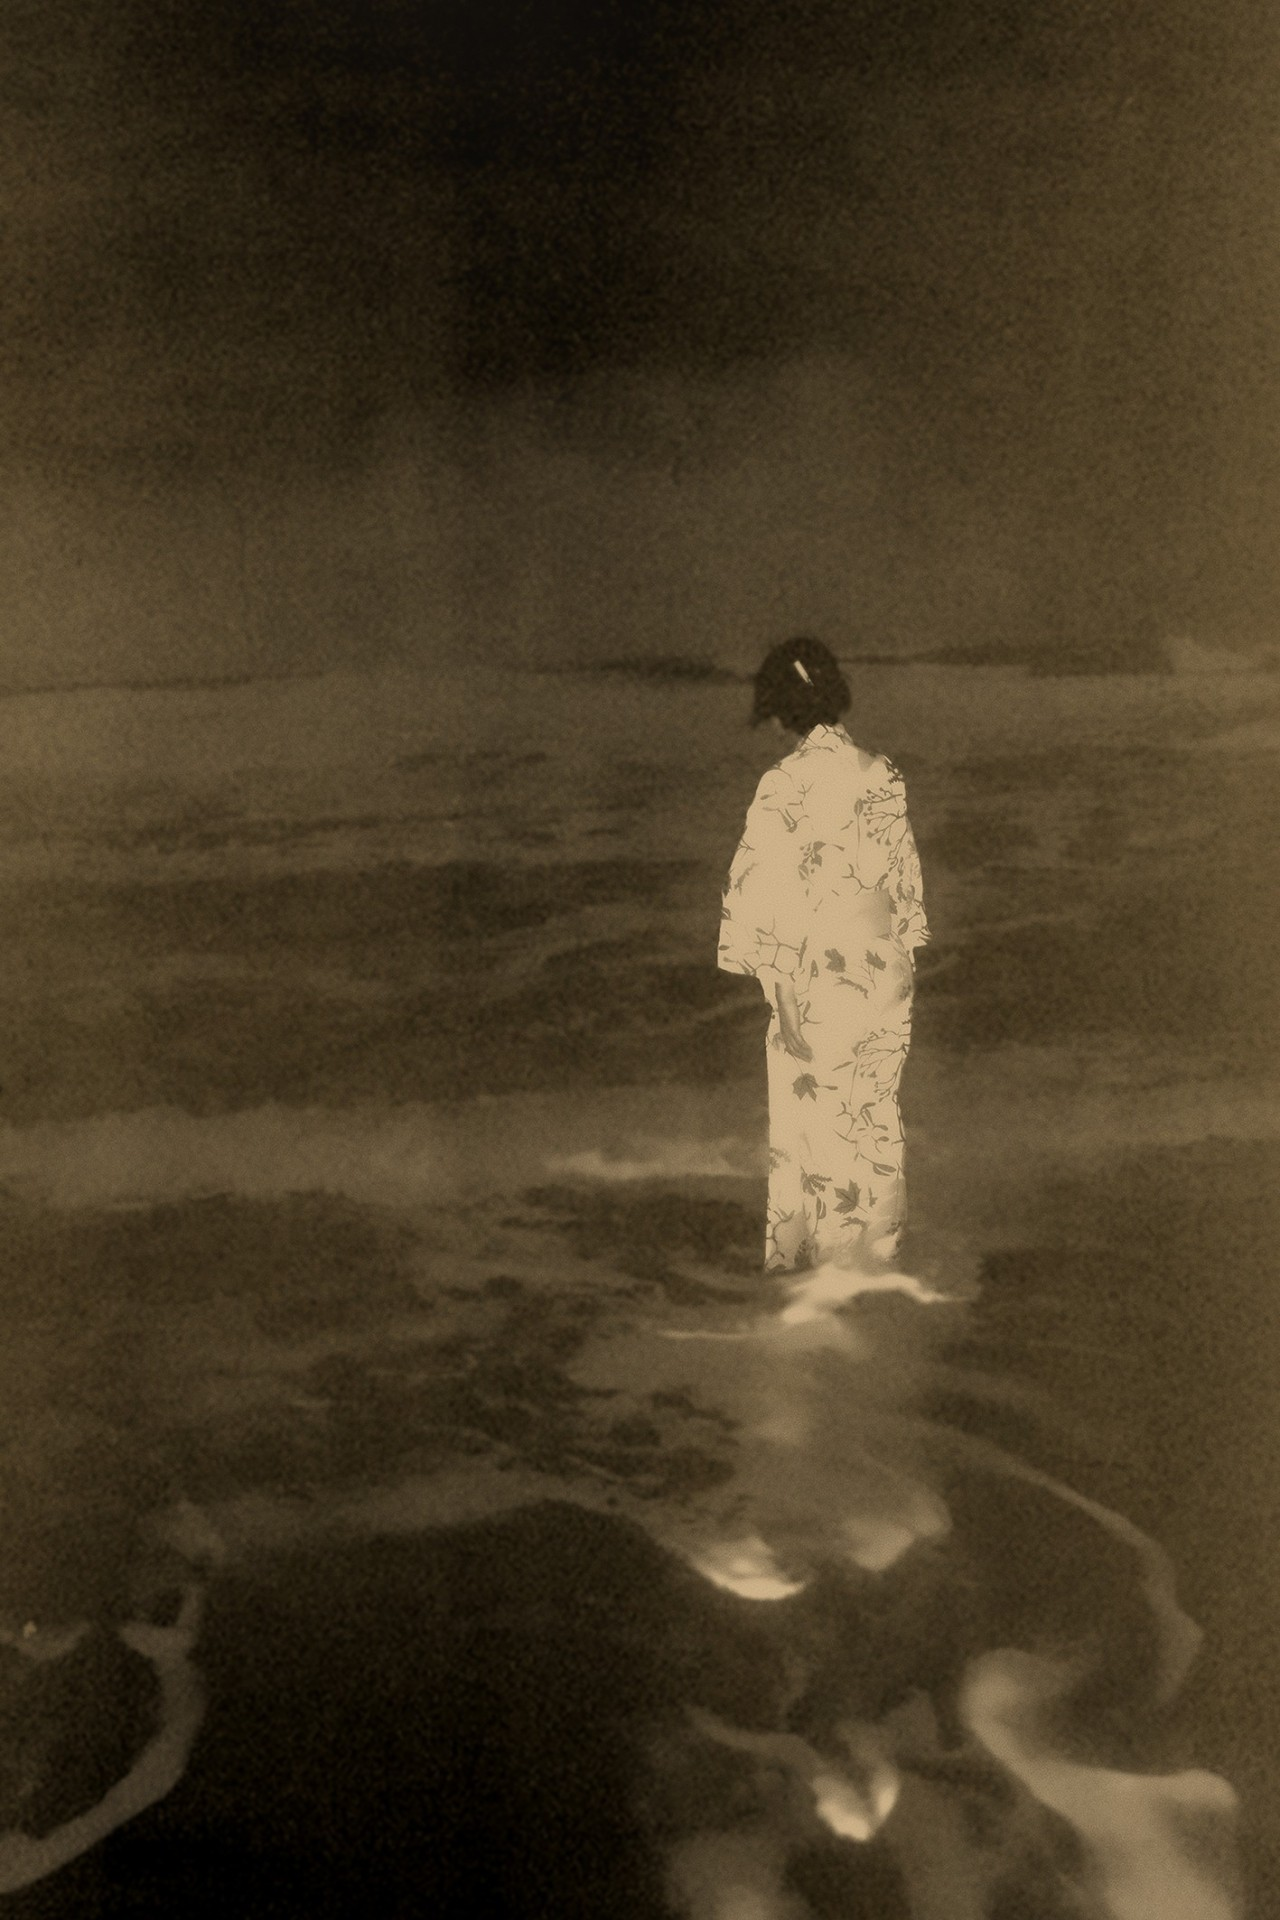 Мика у моря, 2019. Фотограф Пол Купидо